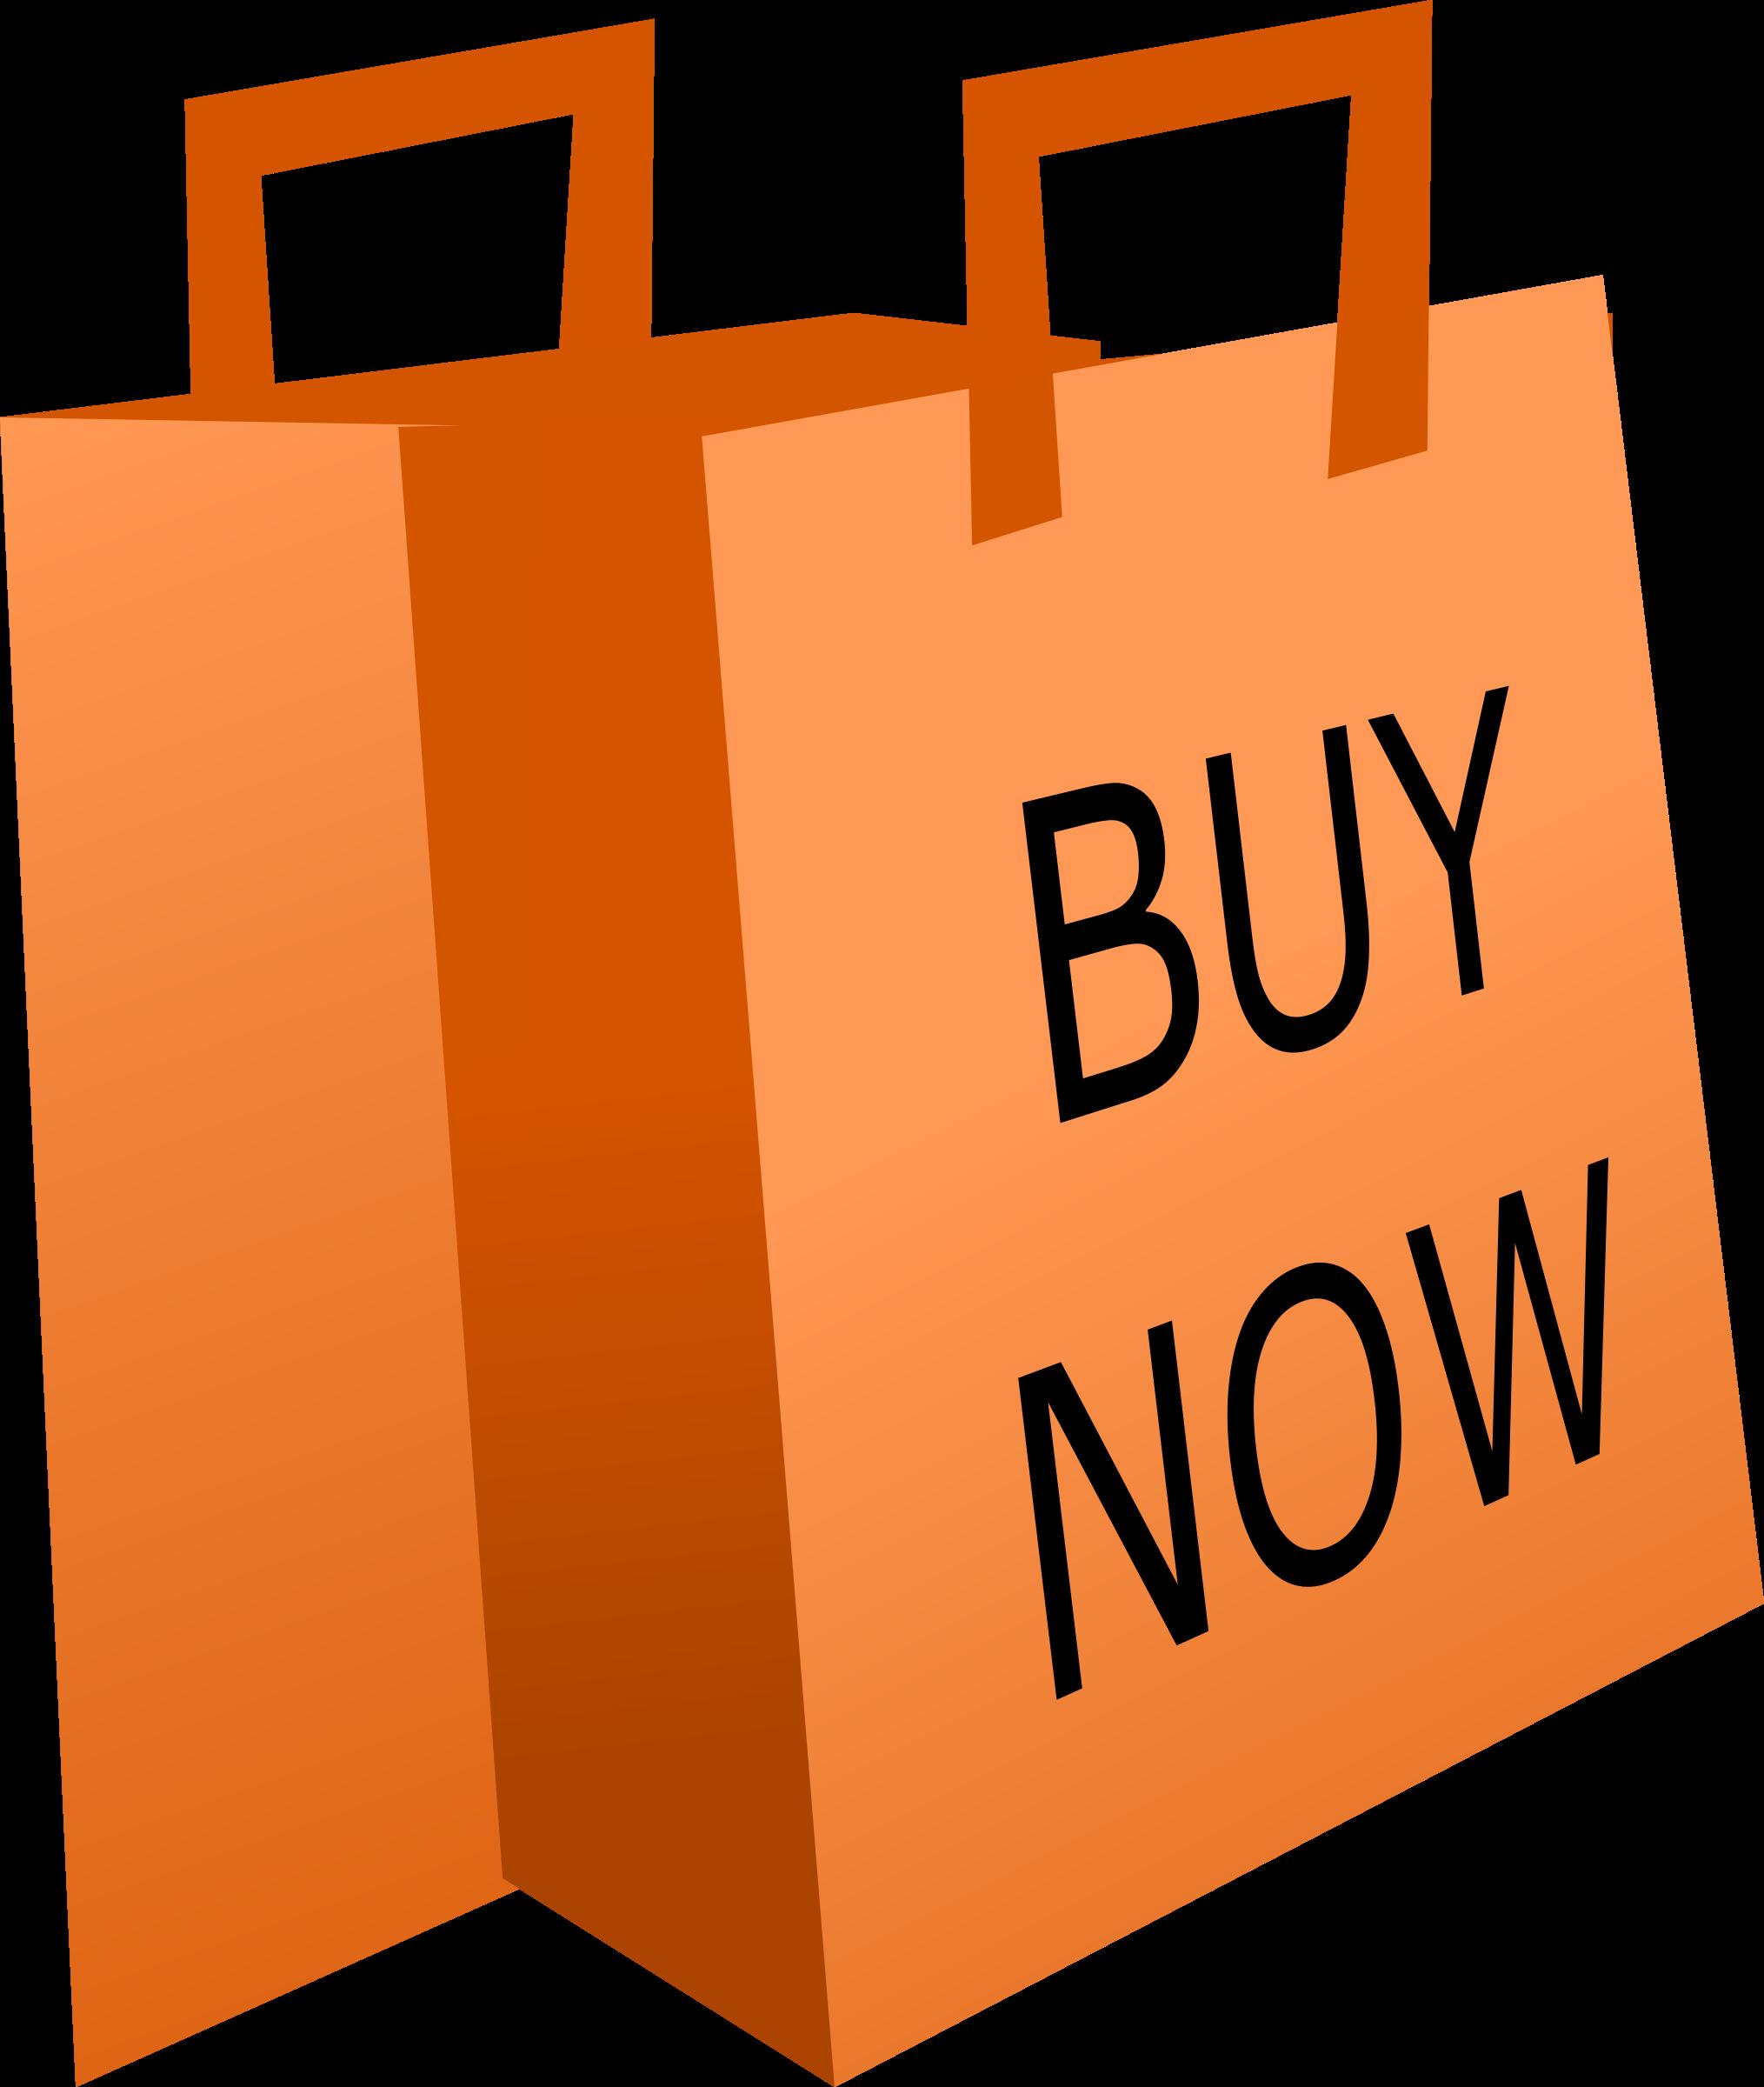 Shopping bags clipart shopping bag